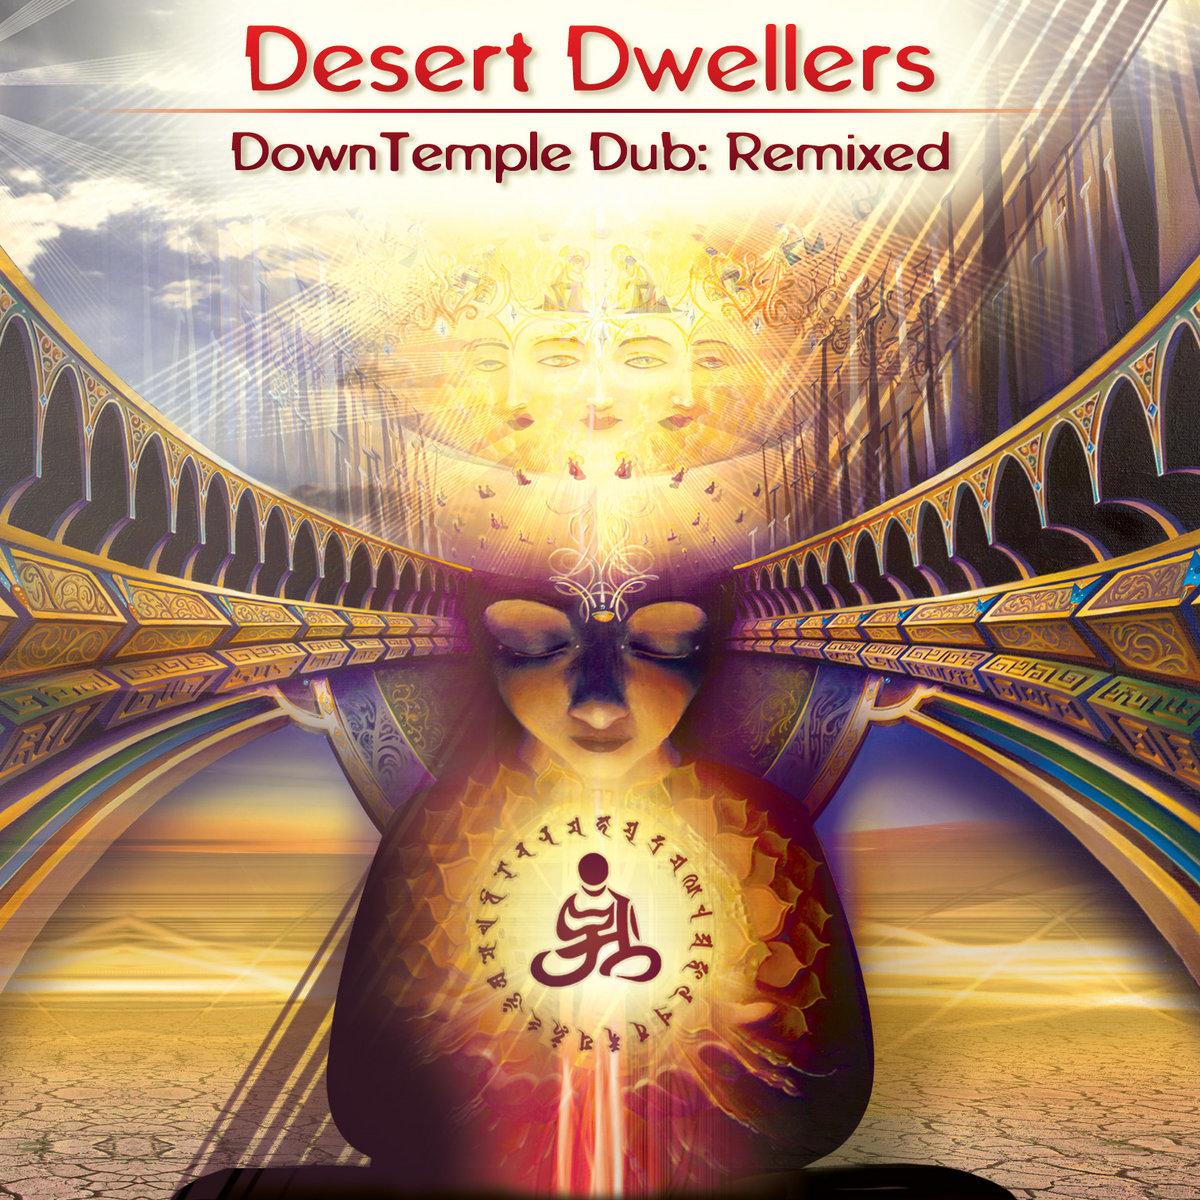 DownTemple Dub: Remixed   Black Swan Sounds